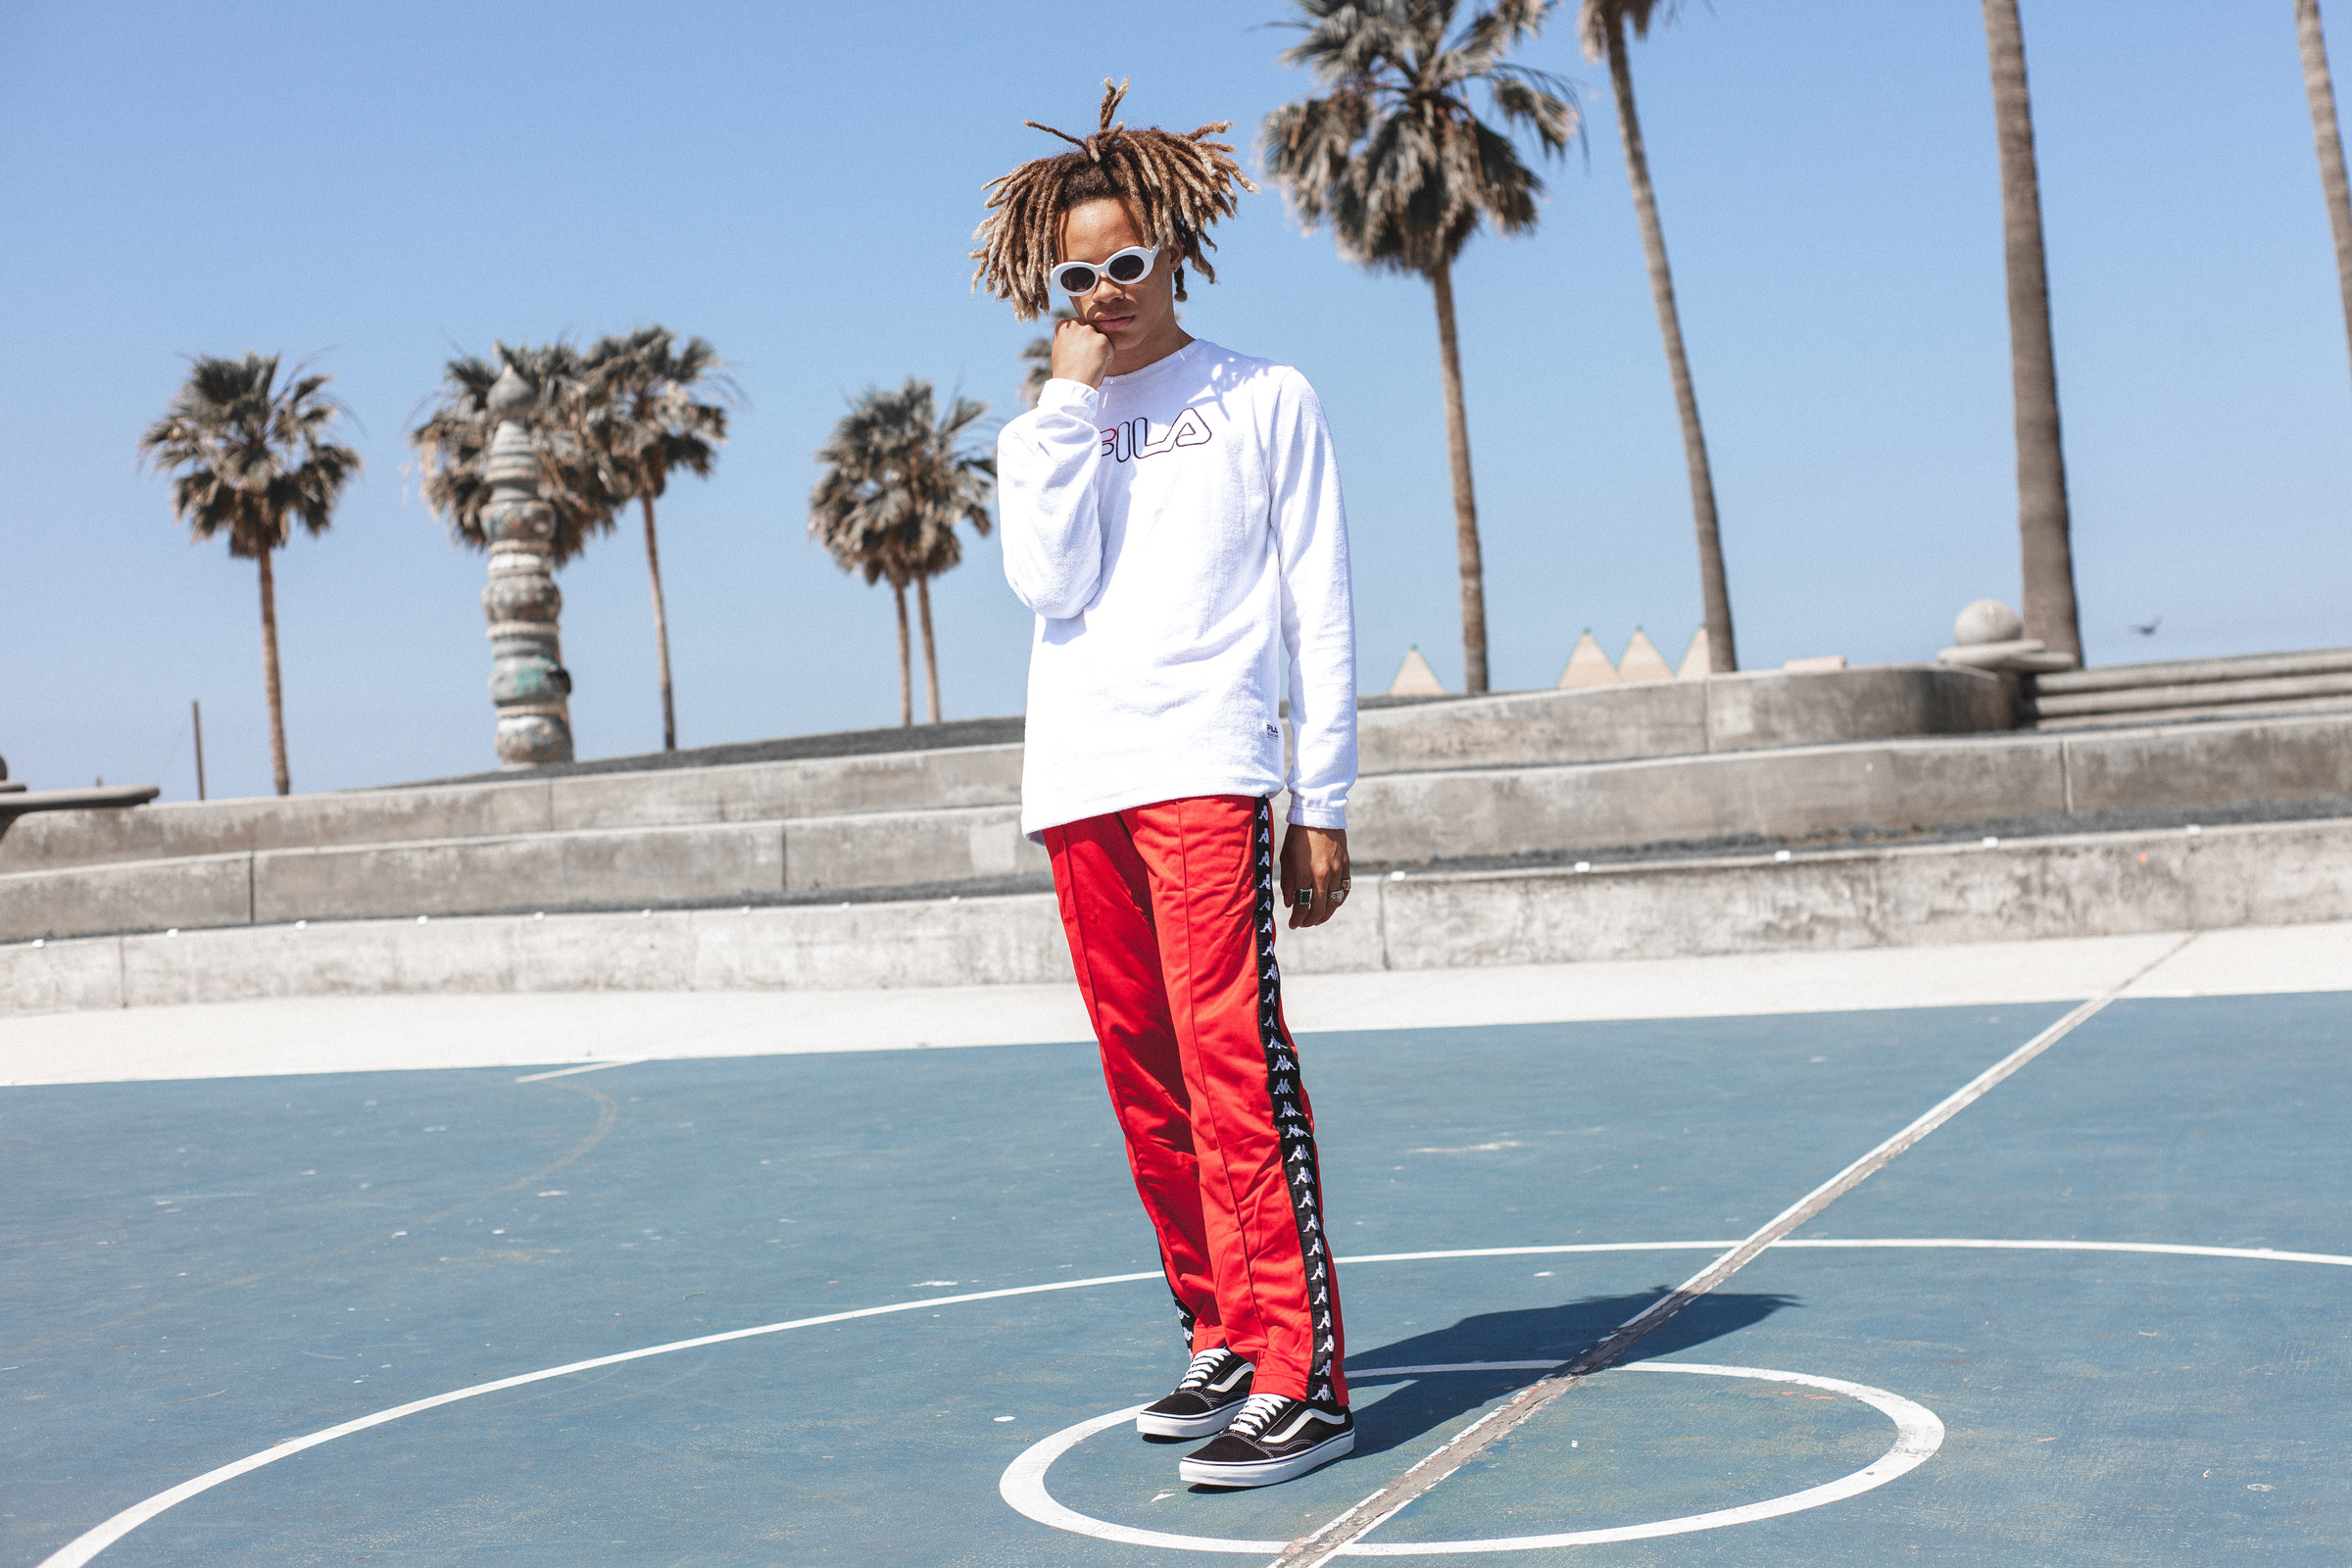 PAUSE Editorial: Venice Beach